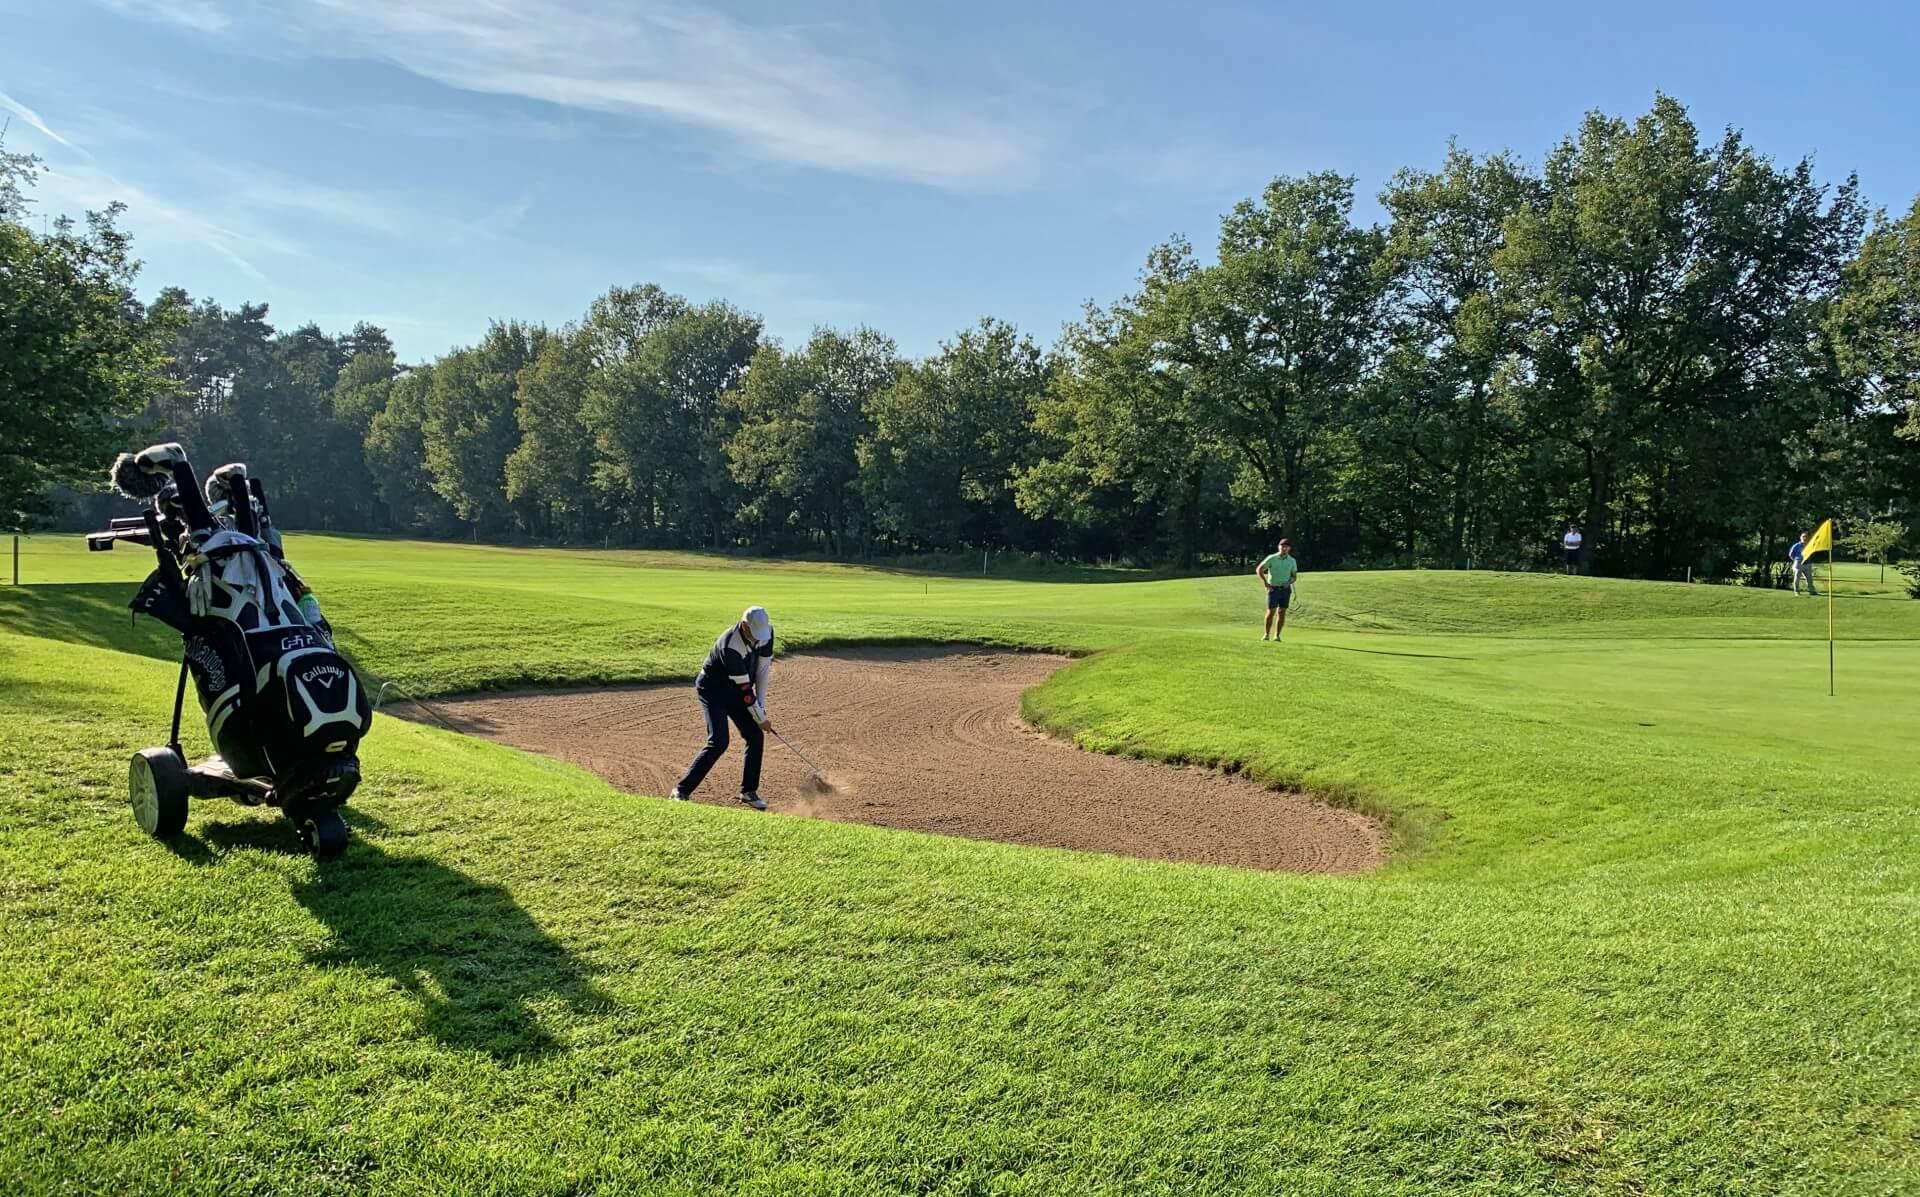 https://golfclub-peckeloh.de/wp-content/uploads/2021/09/2021_Letzter_Bunkerschlag_neuen_Clubmeister_GMS.jpg